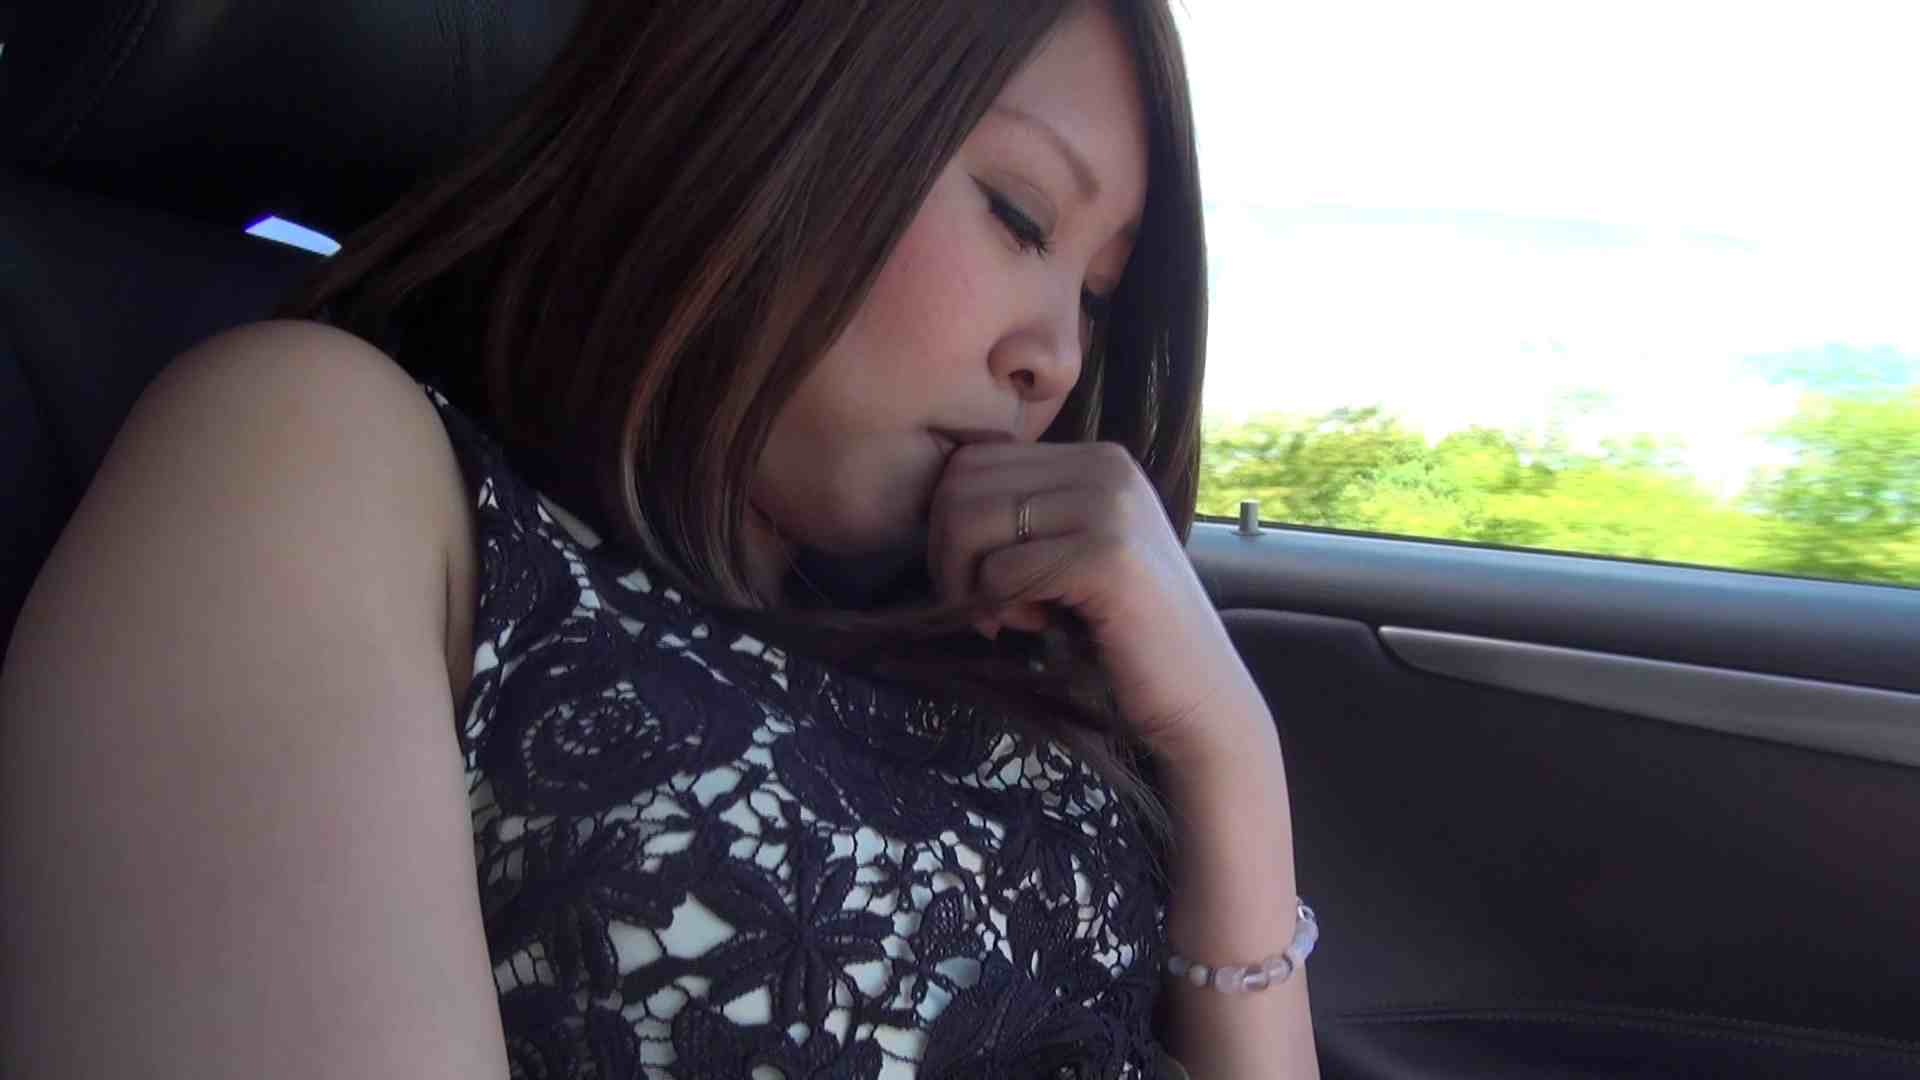 episode6 ドライブ中に・・・妻に強せいオナニー オナニー  106pic 28